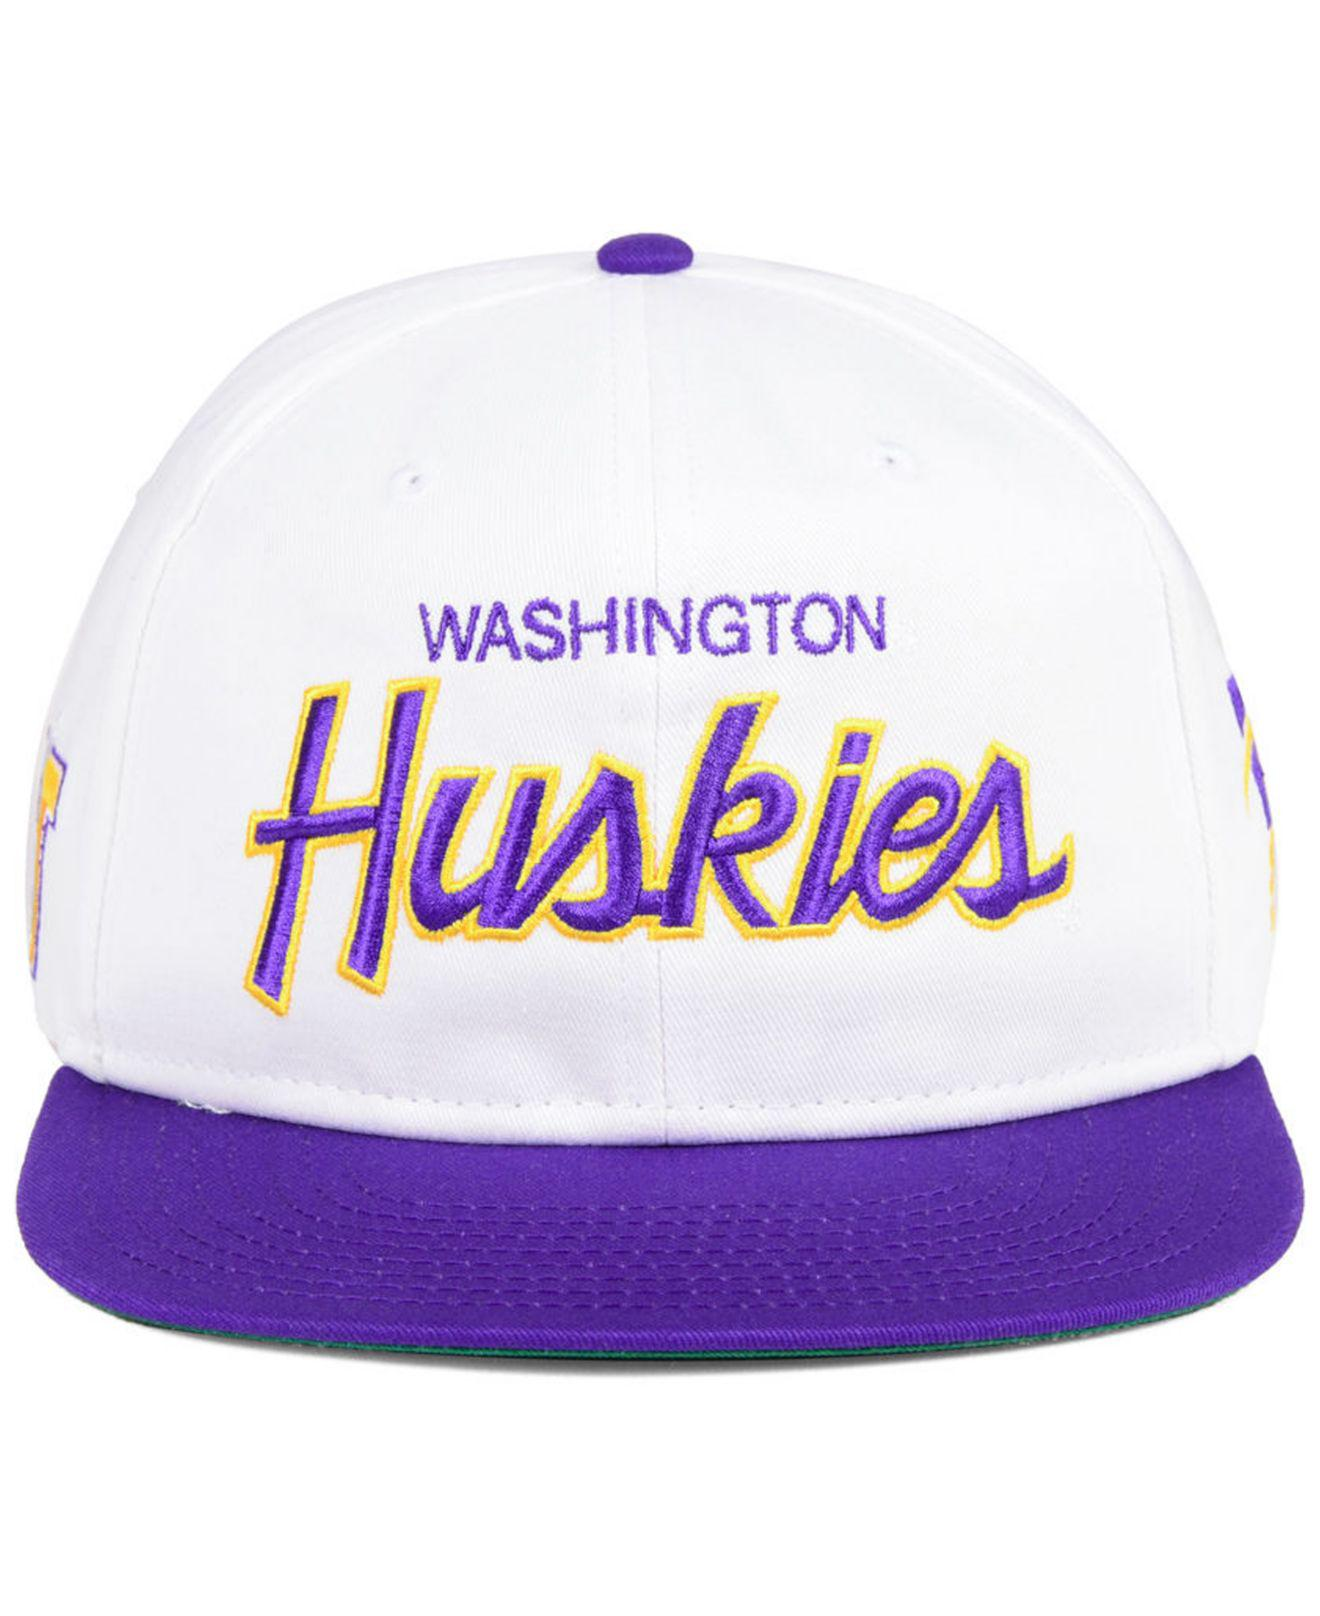 buy popular e3b0e a1a77 ... coupon lyst nike washington huskies sport specialties snapback cap in  3870a 3b9a2